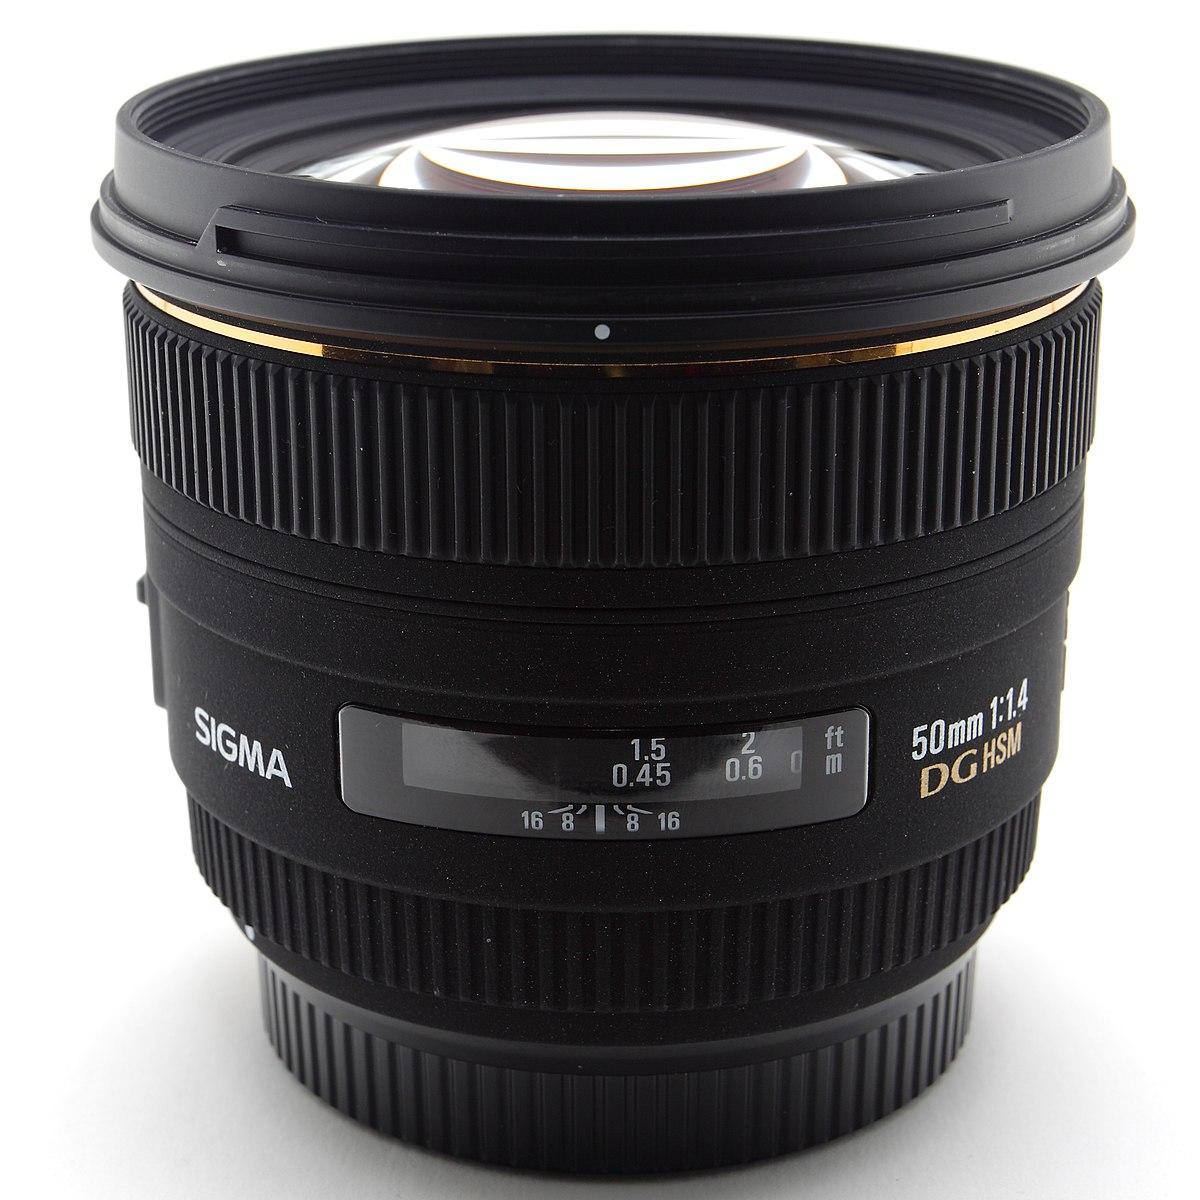 Sigma 50mm F 14 Ex Dg Hsm Lens Wikipedia 24mm 28 Art For Canon Ef